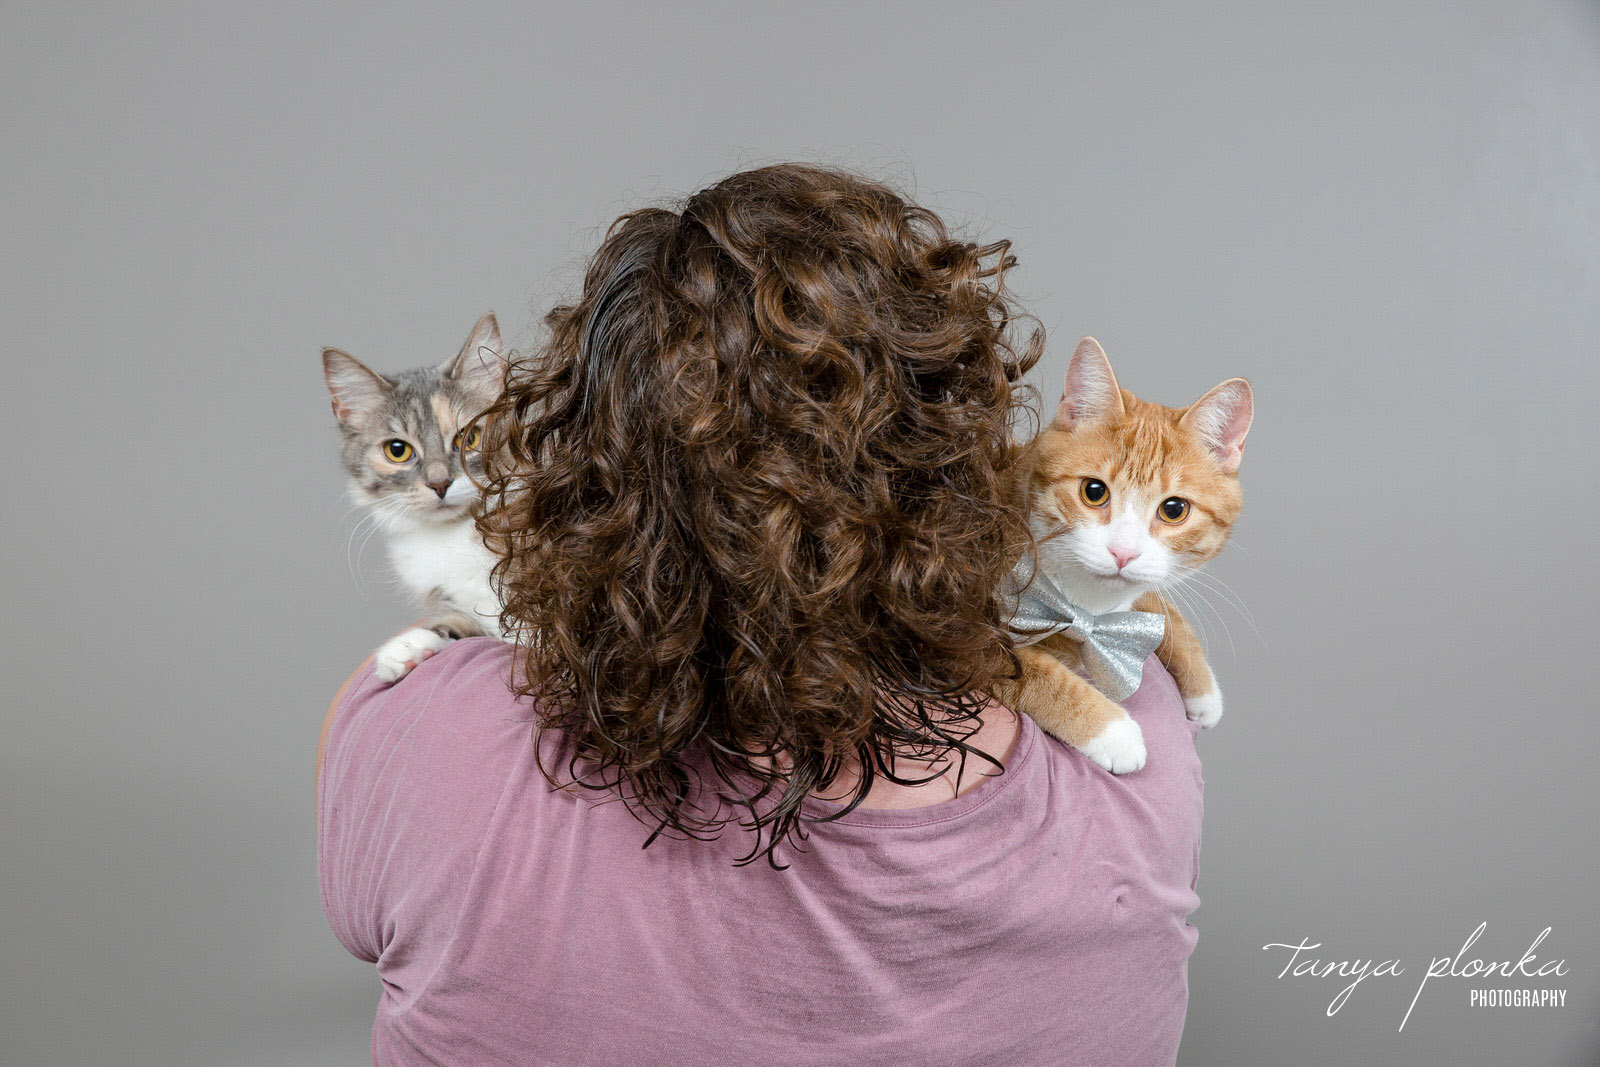 Cute Cats looking over human's shoulder